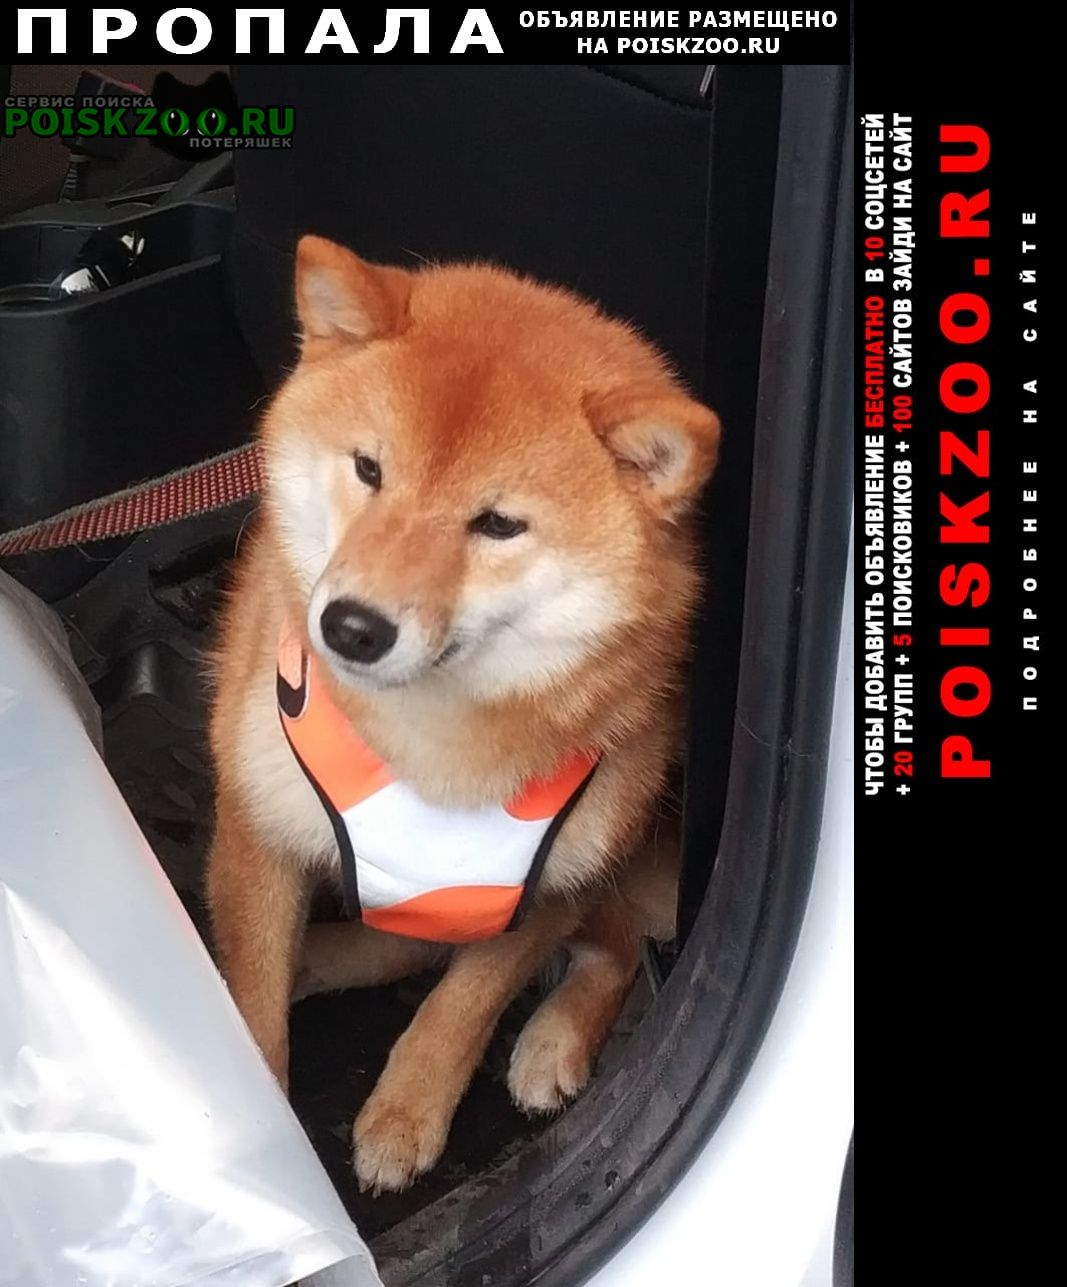 Пропала собака посёлок болдино Петушки